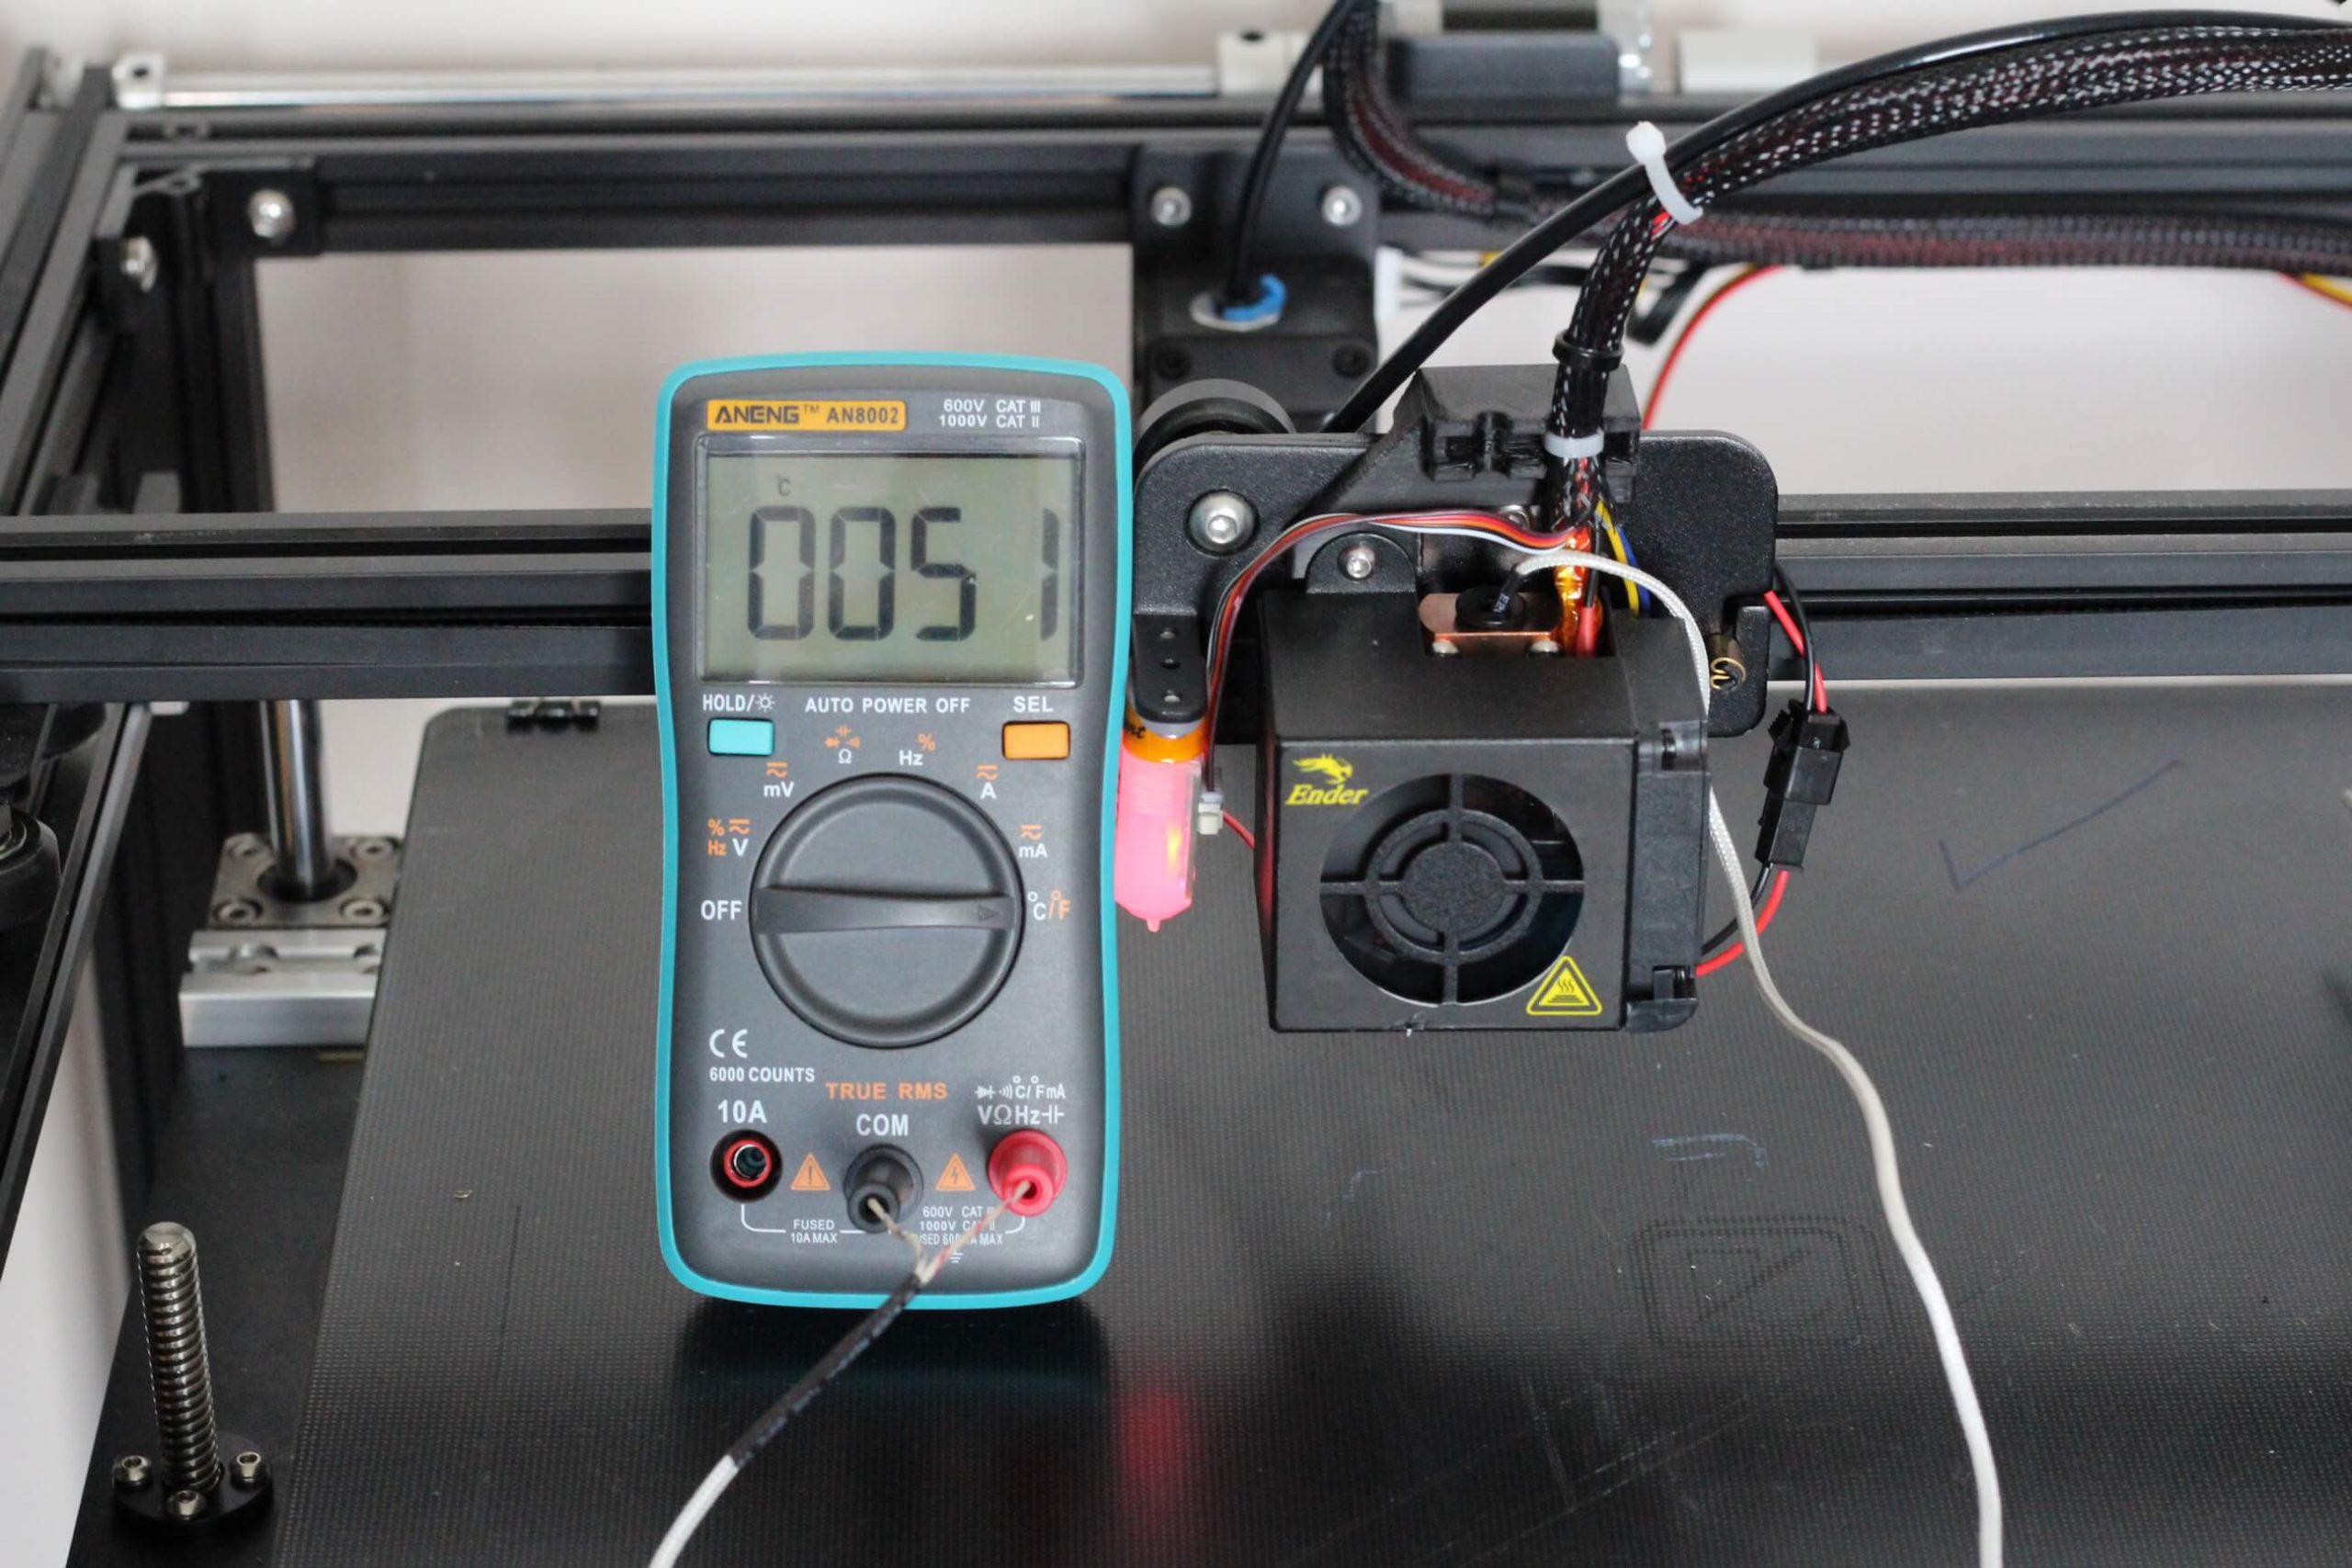 NF-Smart-CR10-Copper-Hotend-Temperature-4